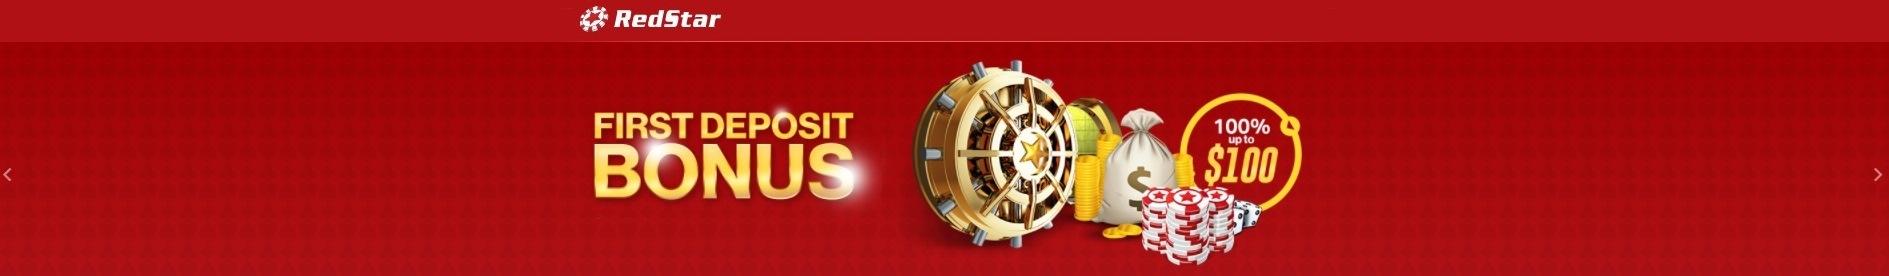 RedStar Casino Poker Sportsbook